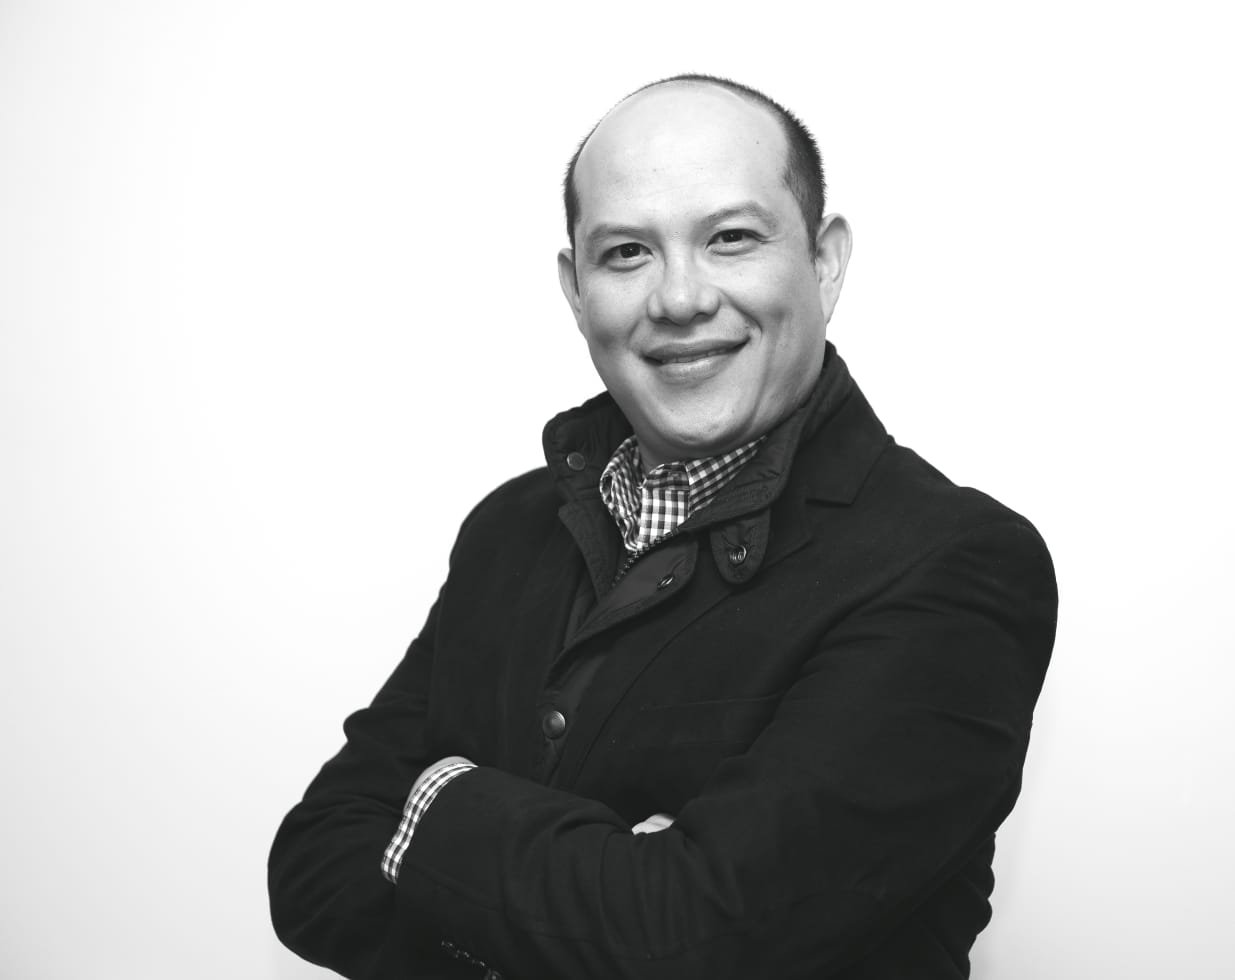 Vladimir Juárez